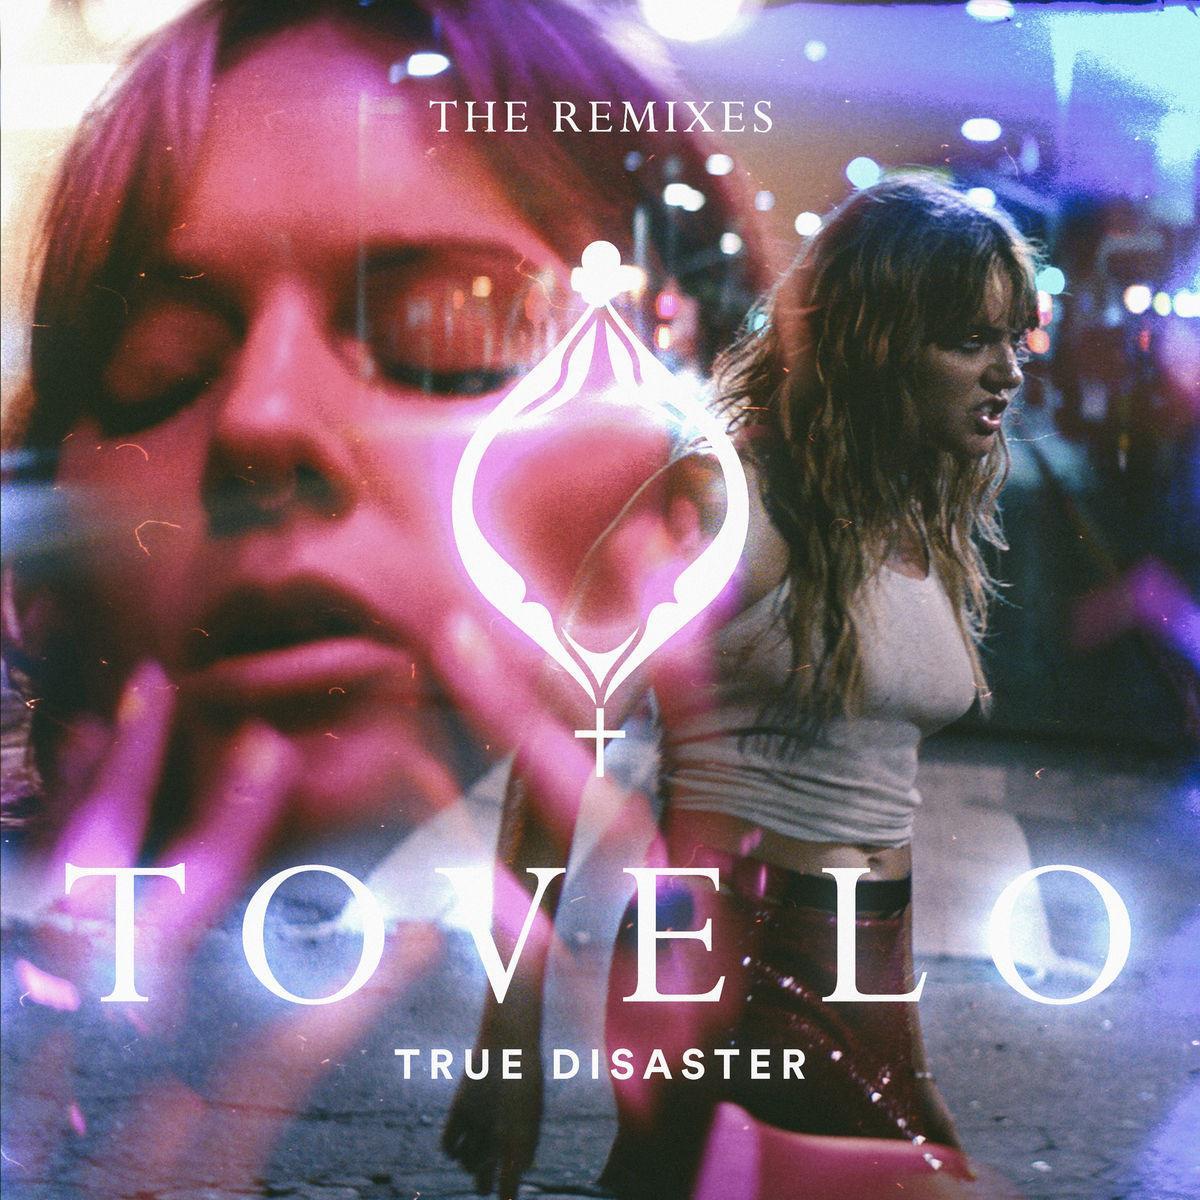 True Disaster (The Remixes)